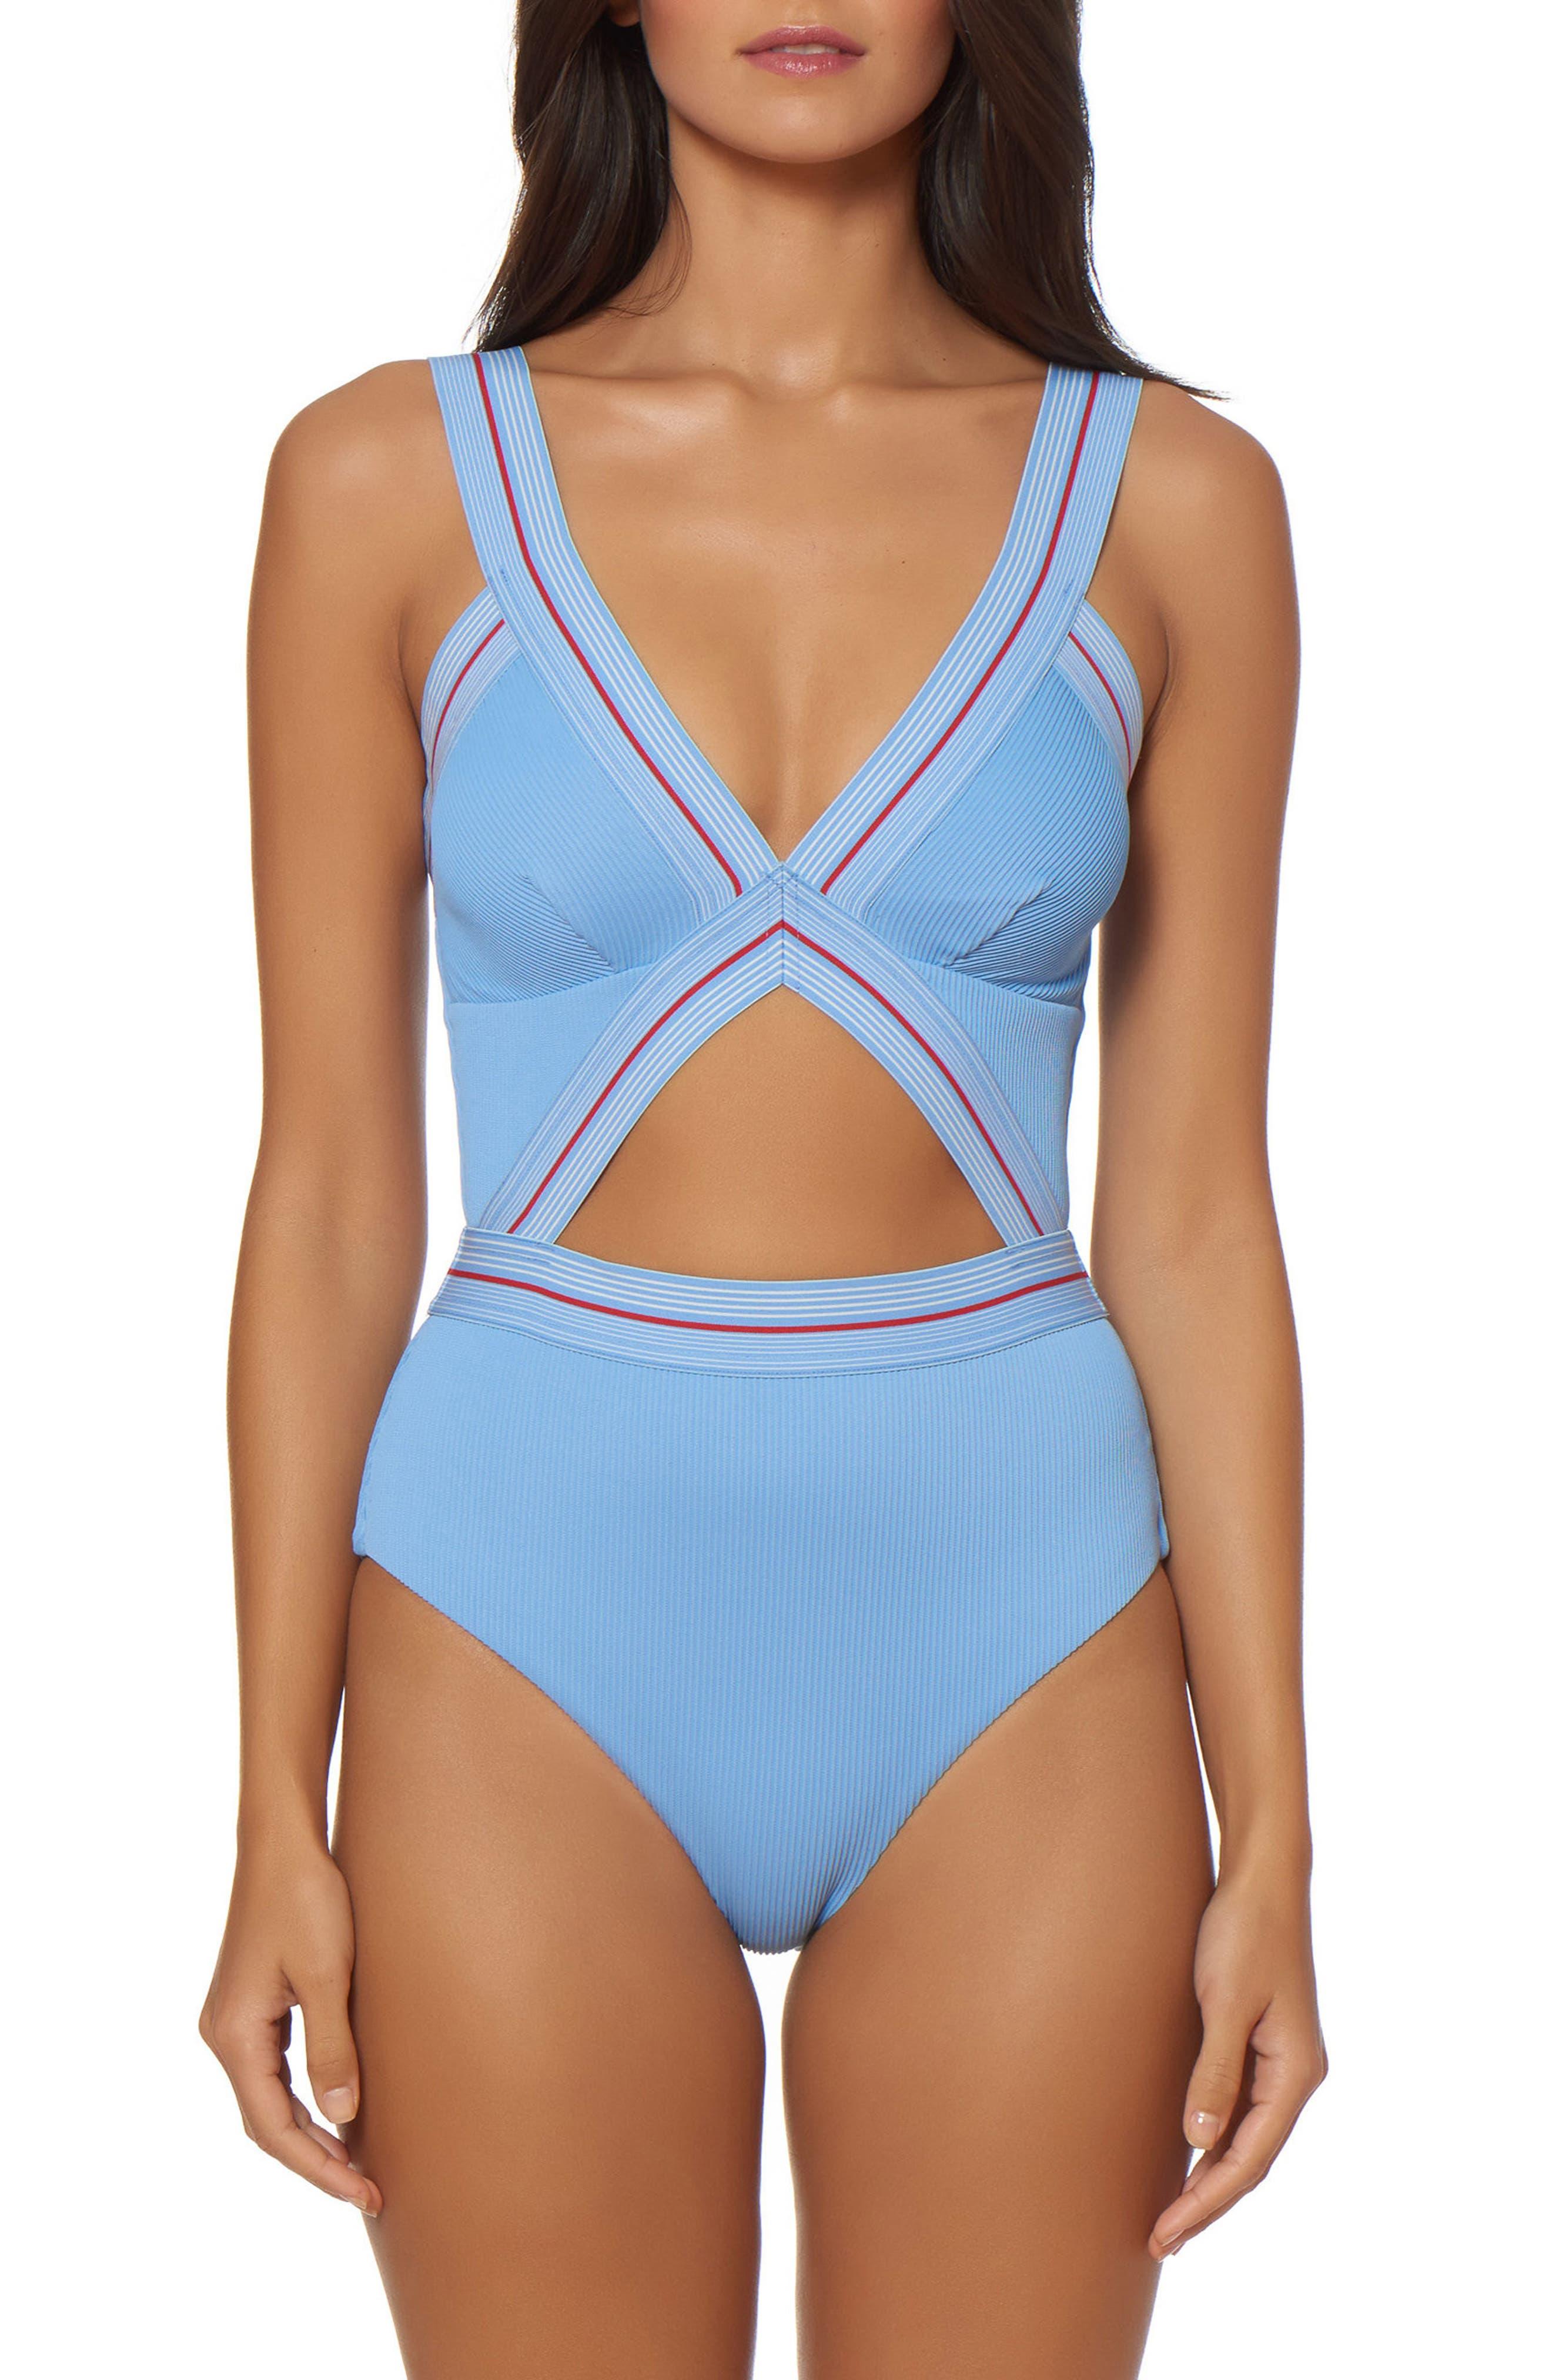 Bondi Beach One-Piece Swimsuit,                             Main thumbnail 1, color,                             452